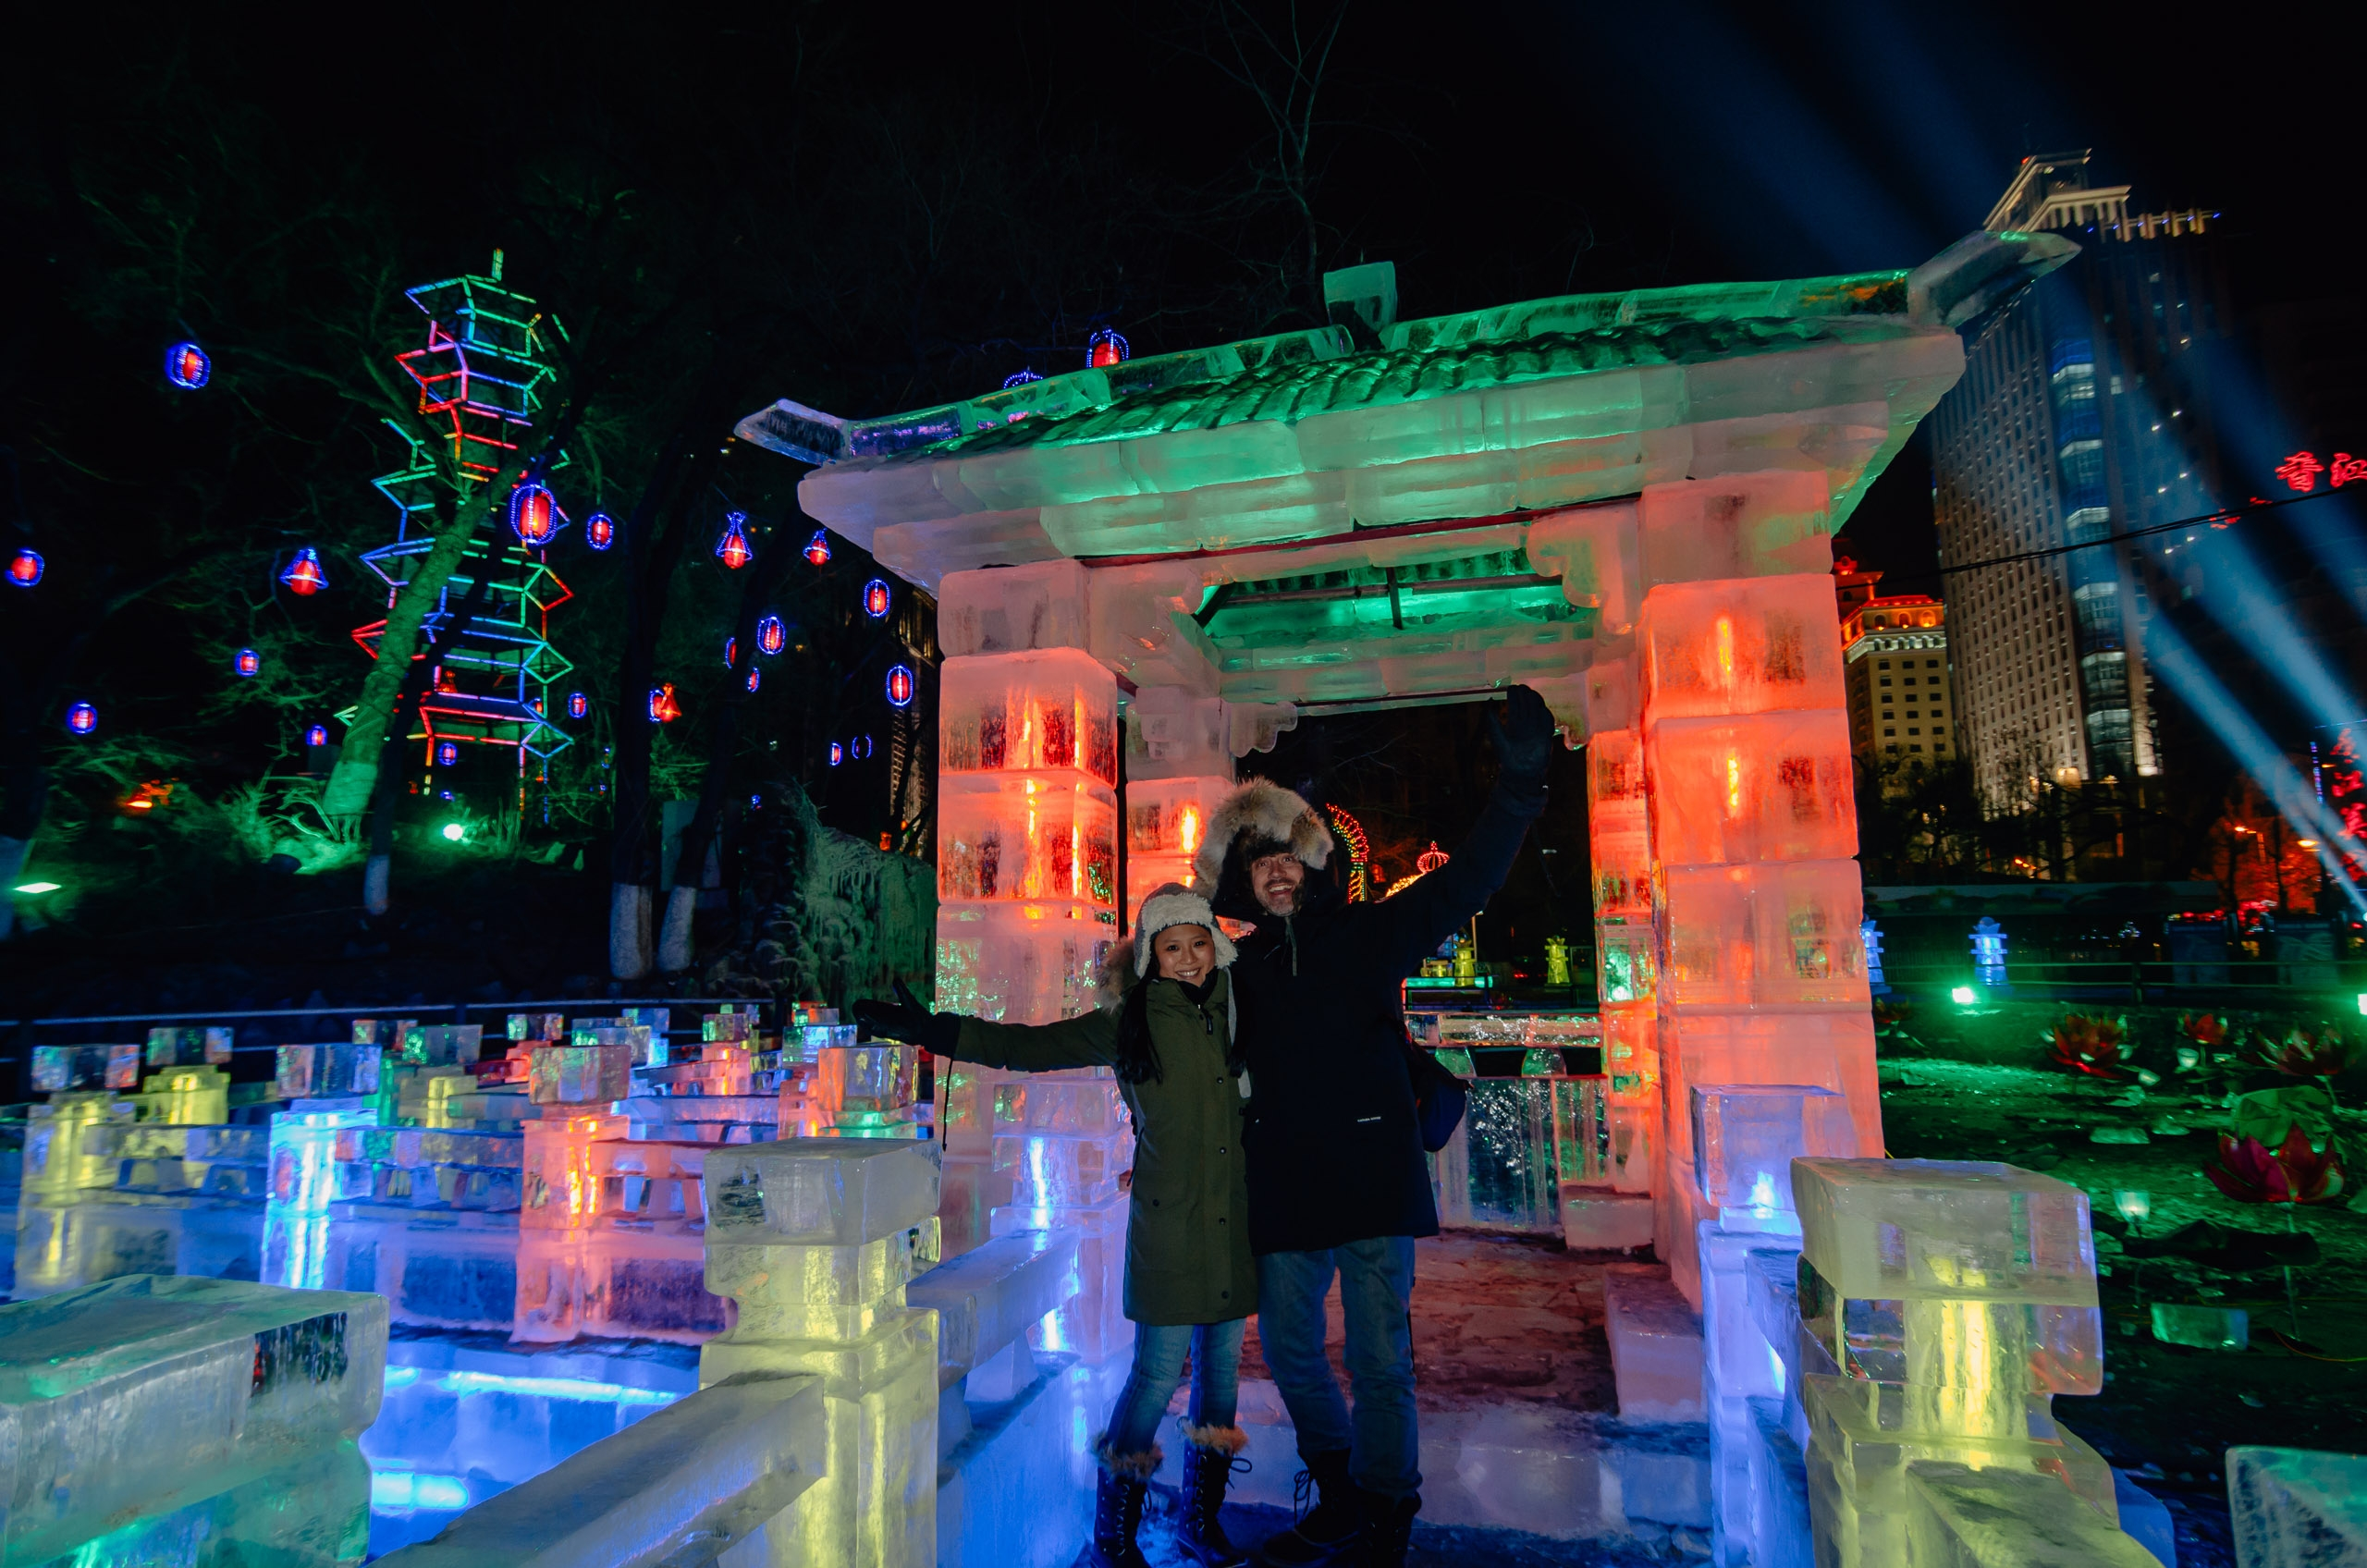 Harbin China Ice Festival - 2012-0108-DSC_1950_7143